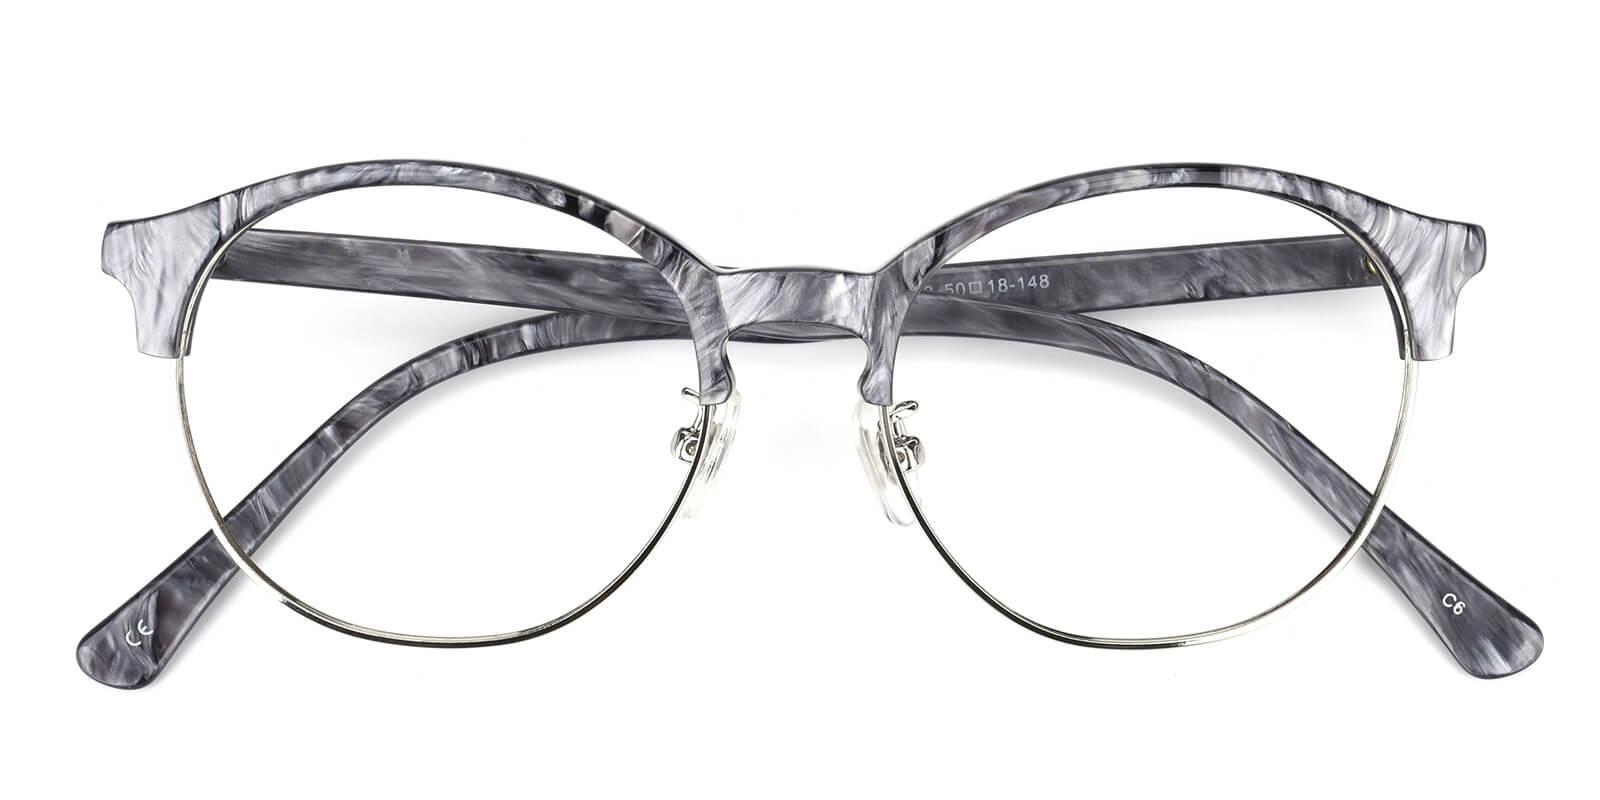 Mandisey-Gray-Browline-Combination-Eyeglasses-detail